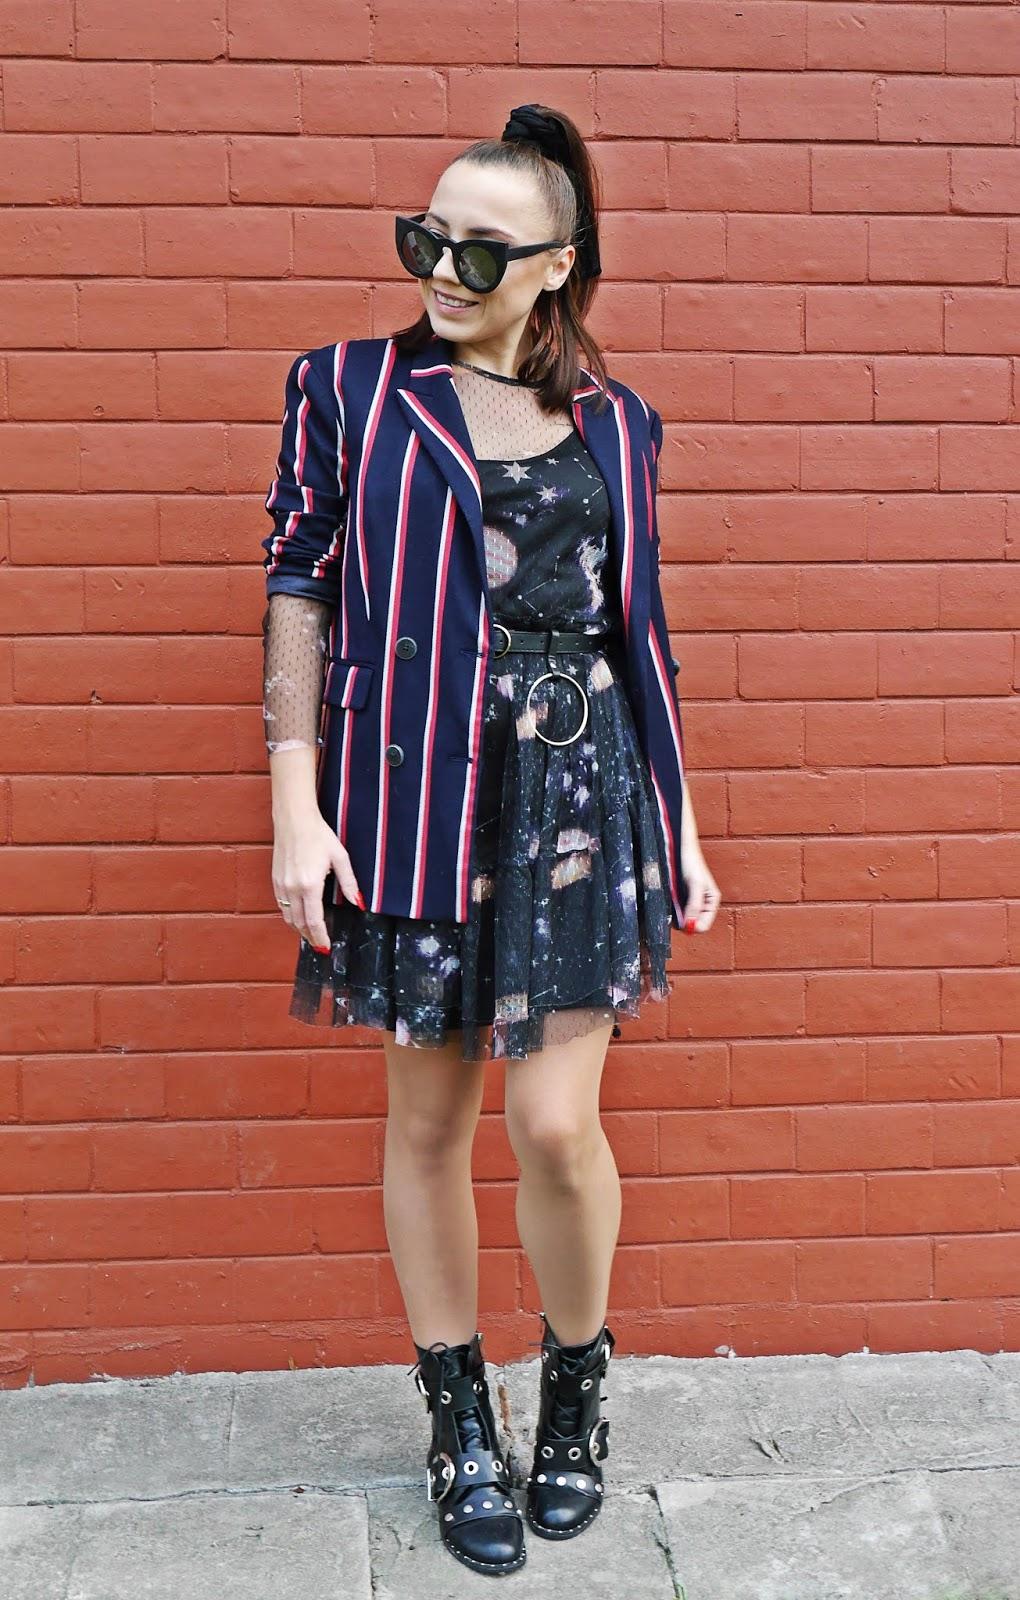 stripes jacket blezer mesh galaxy dress aliexpres belt rock boots fashion blogger karyn puławy outfit look ootd autumn look